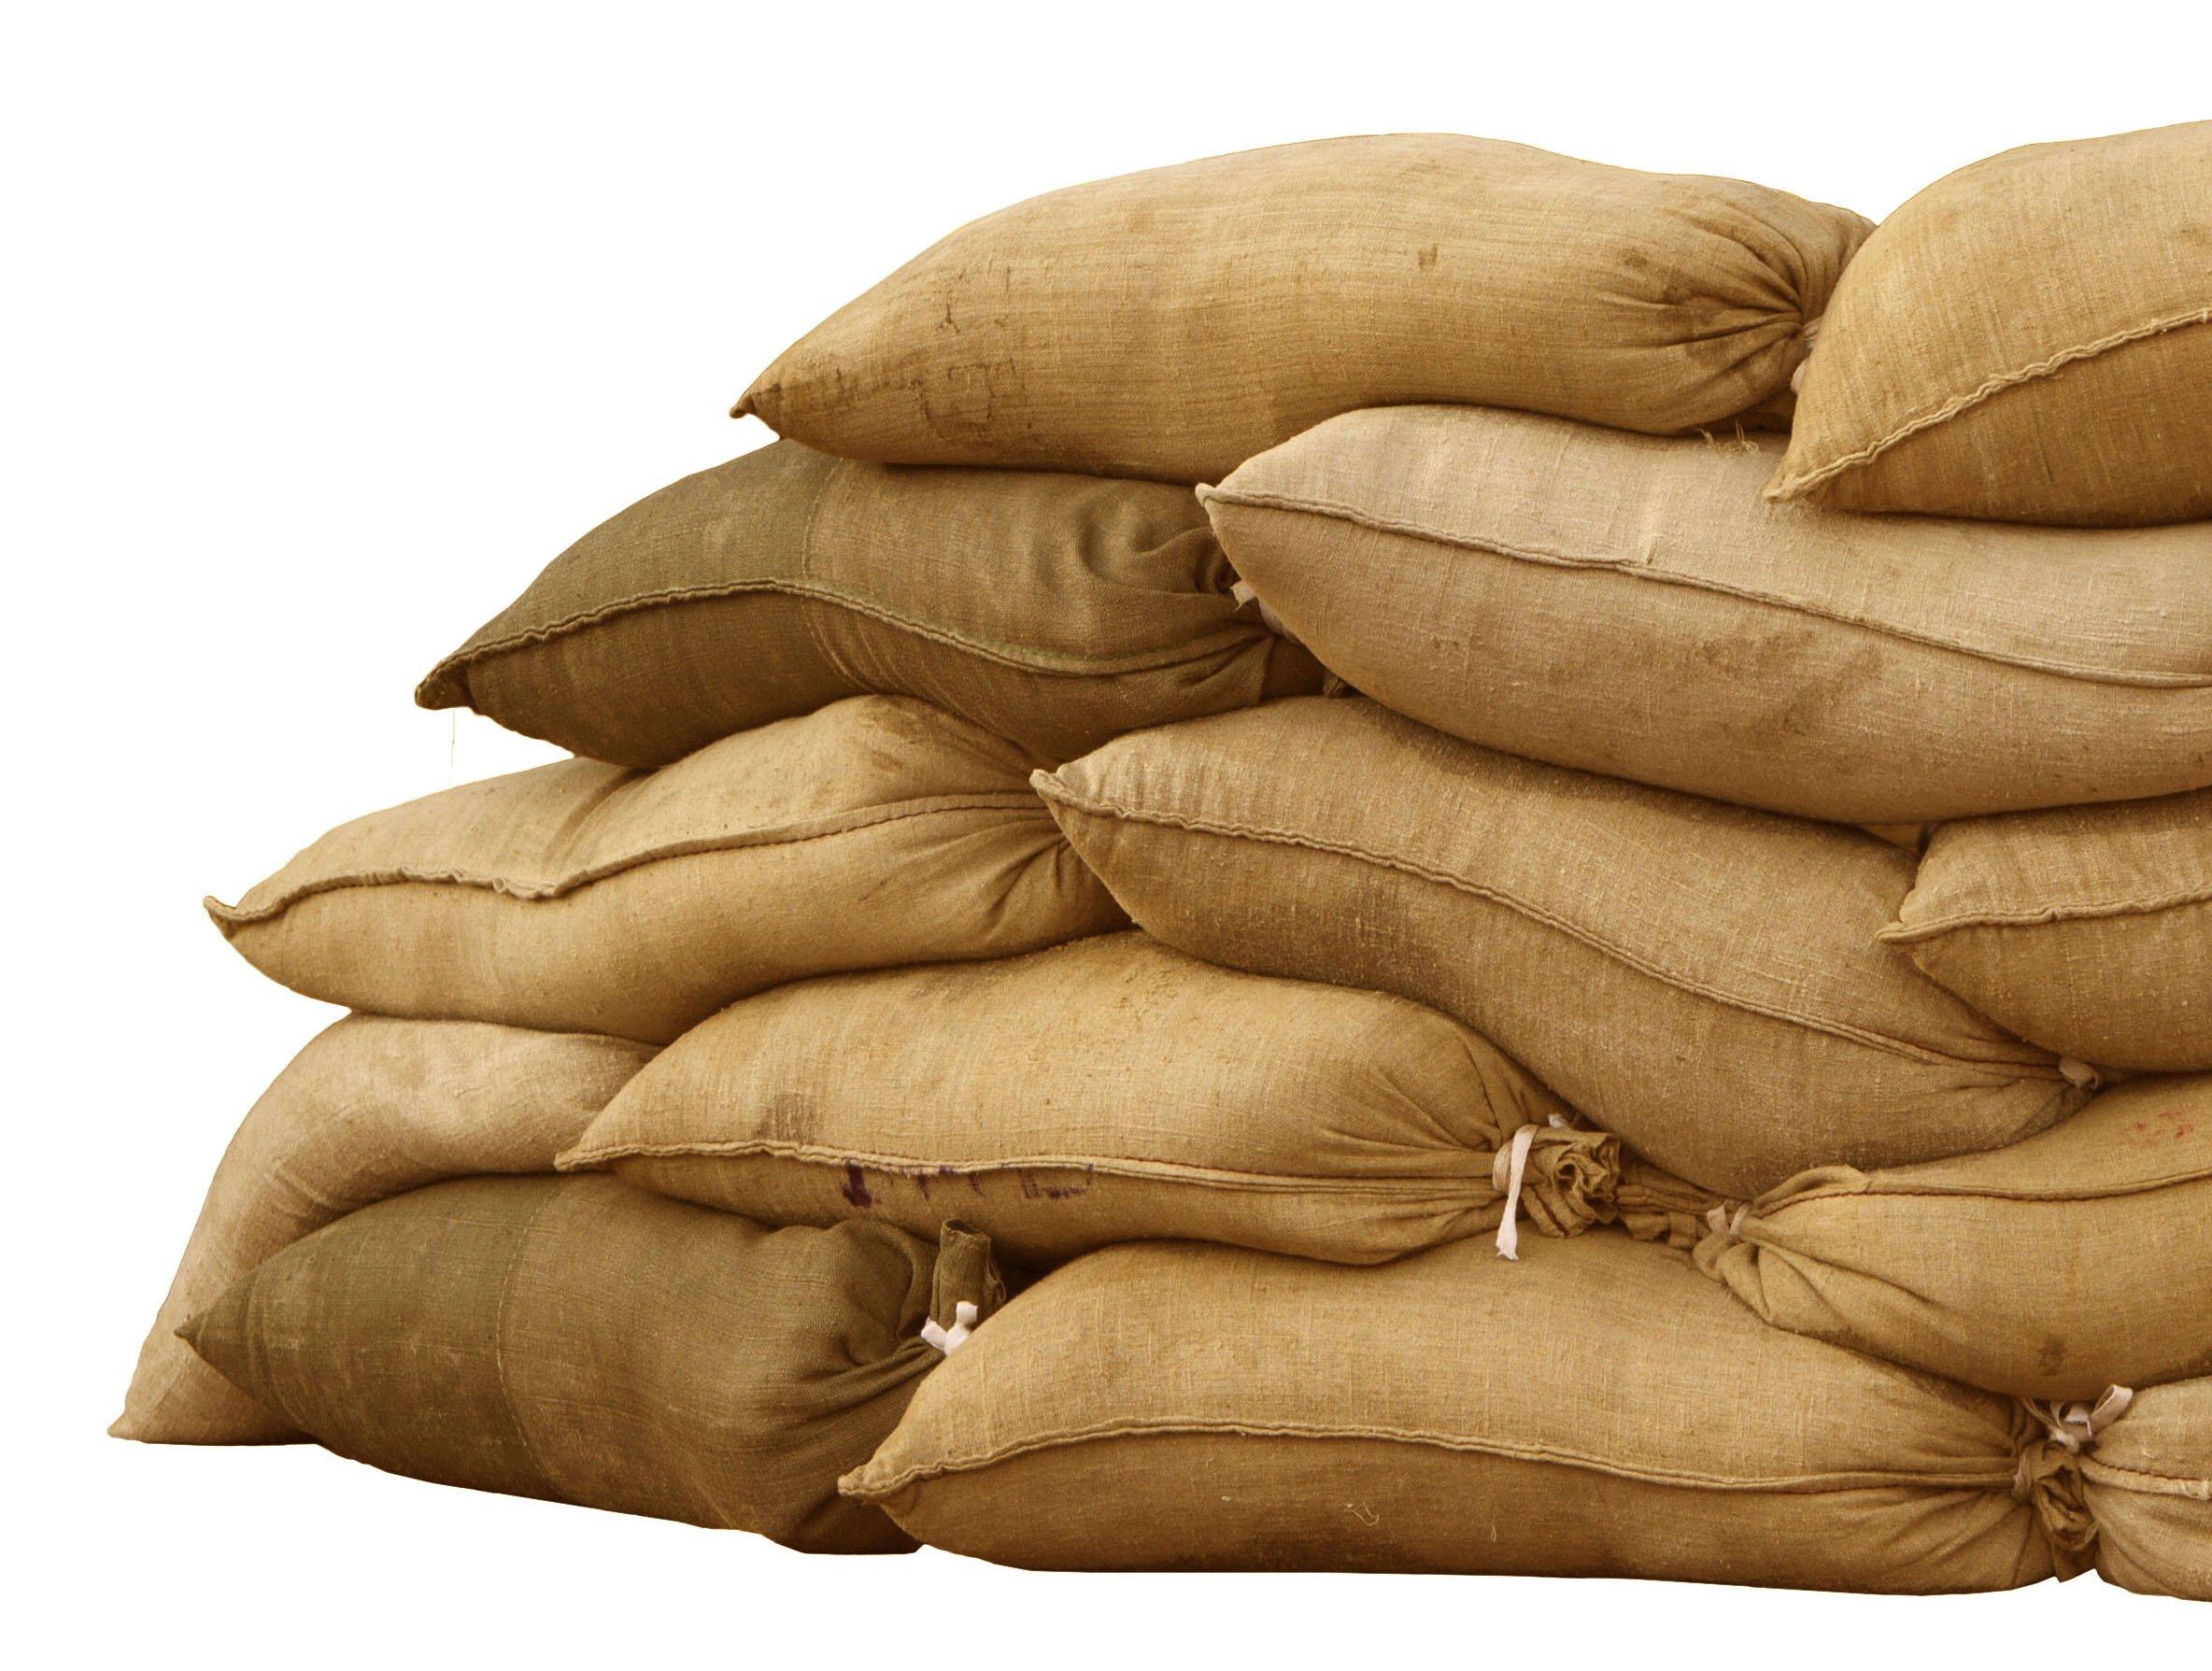 Sandbaggy Burlap Sand Bag - Size: 14'' x 26'' - Sandbags 50lb Weight Capacity - Sandbags for Flooding - Sand Bag - Flood Water Barrier - Water Curb - Tent Sandbags - Store Bags (5 Bags) by Sandbaggy (Image #1)